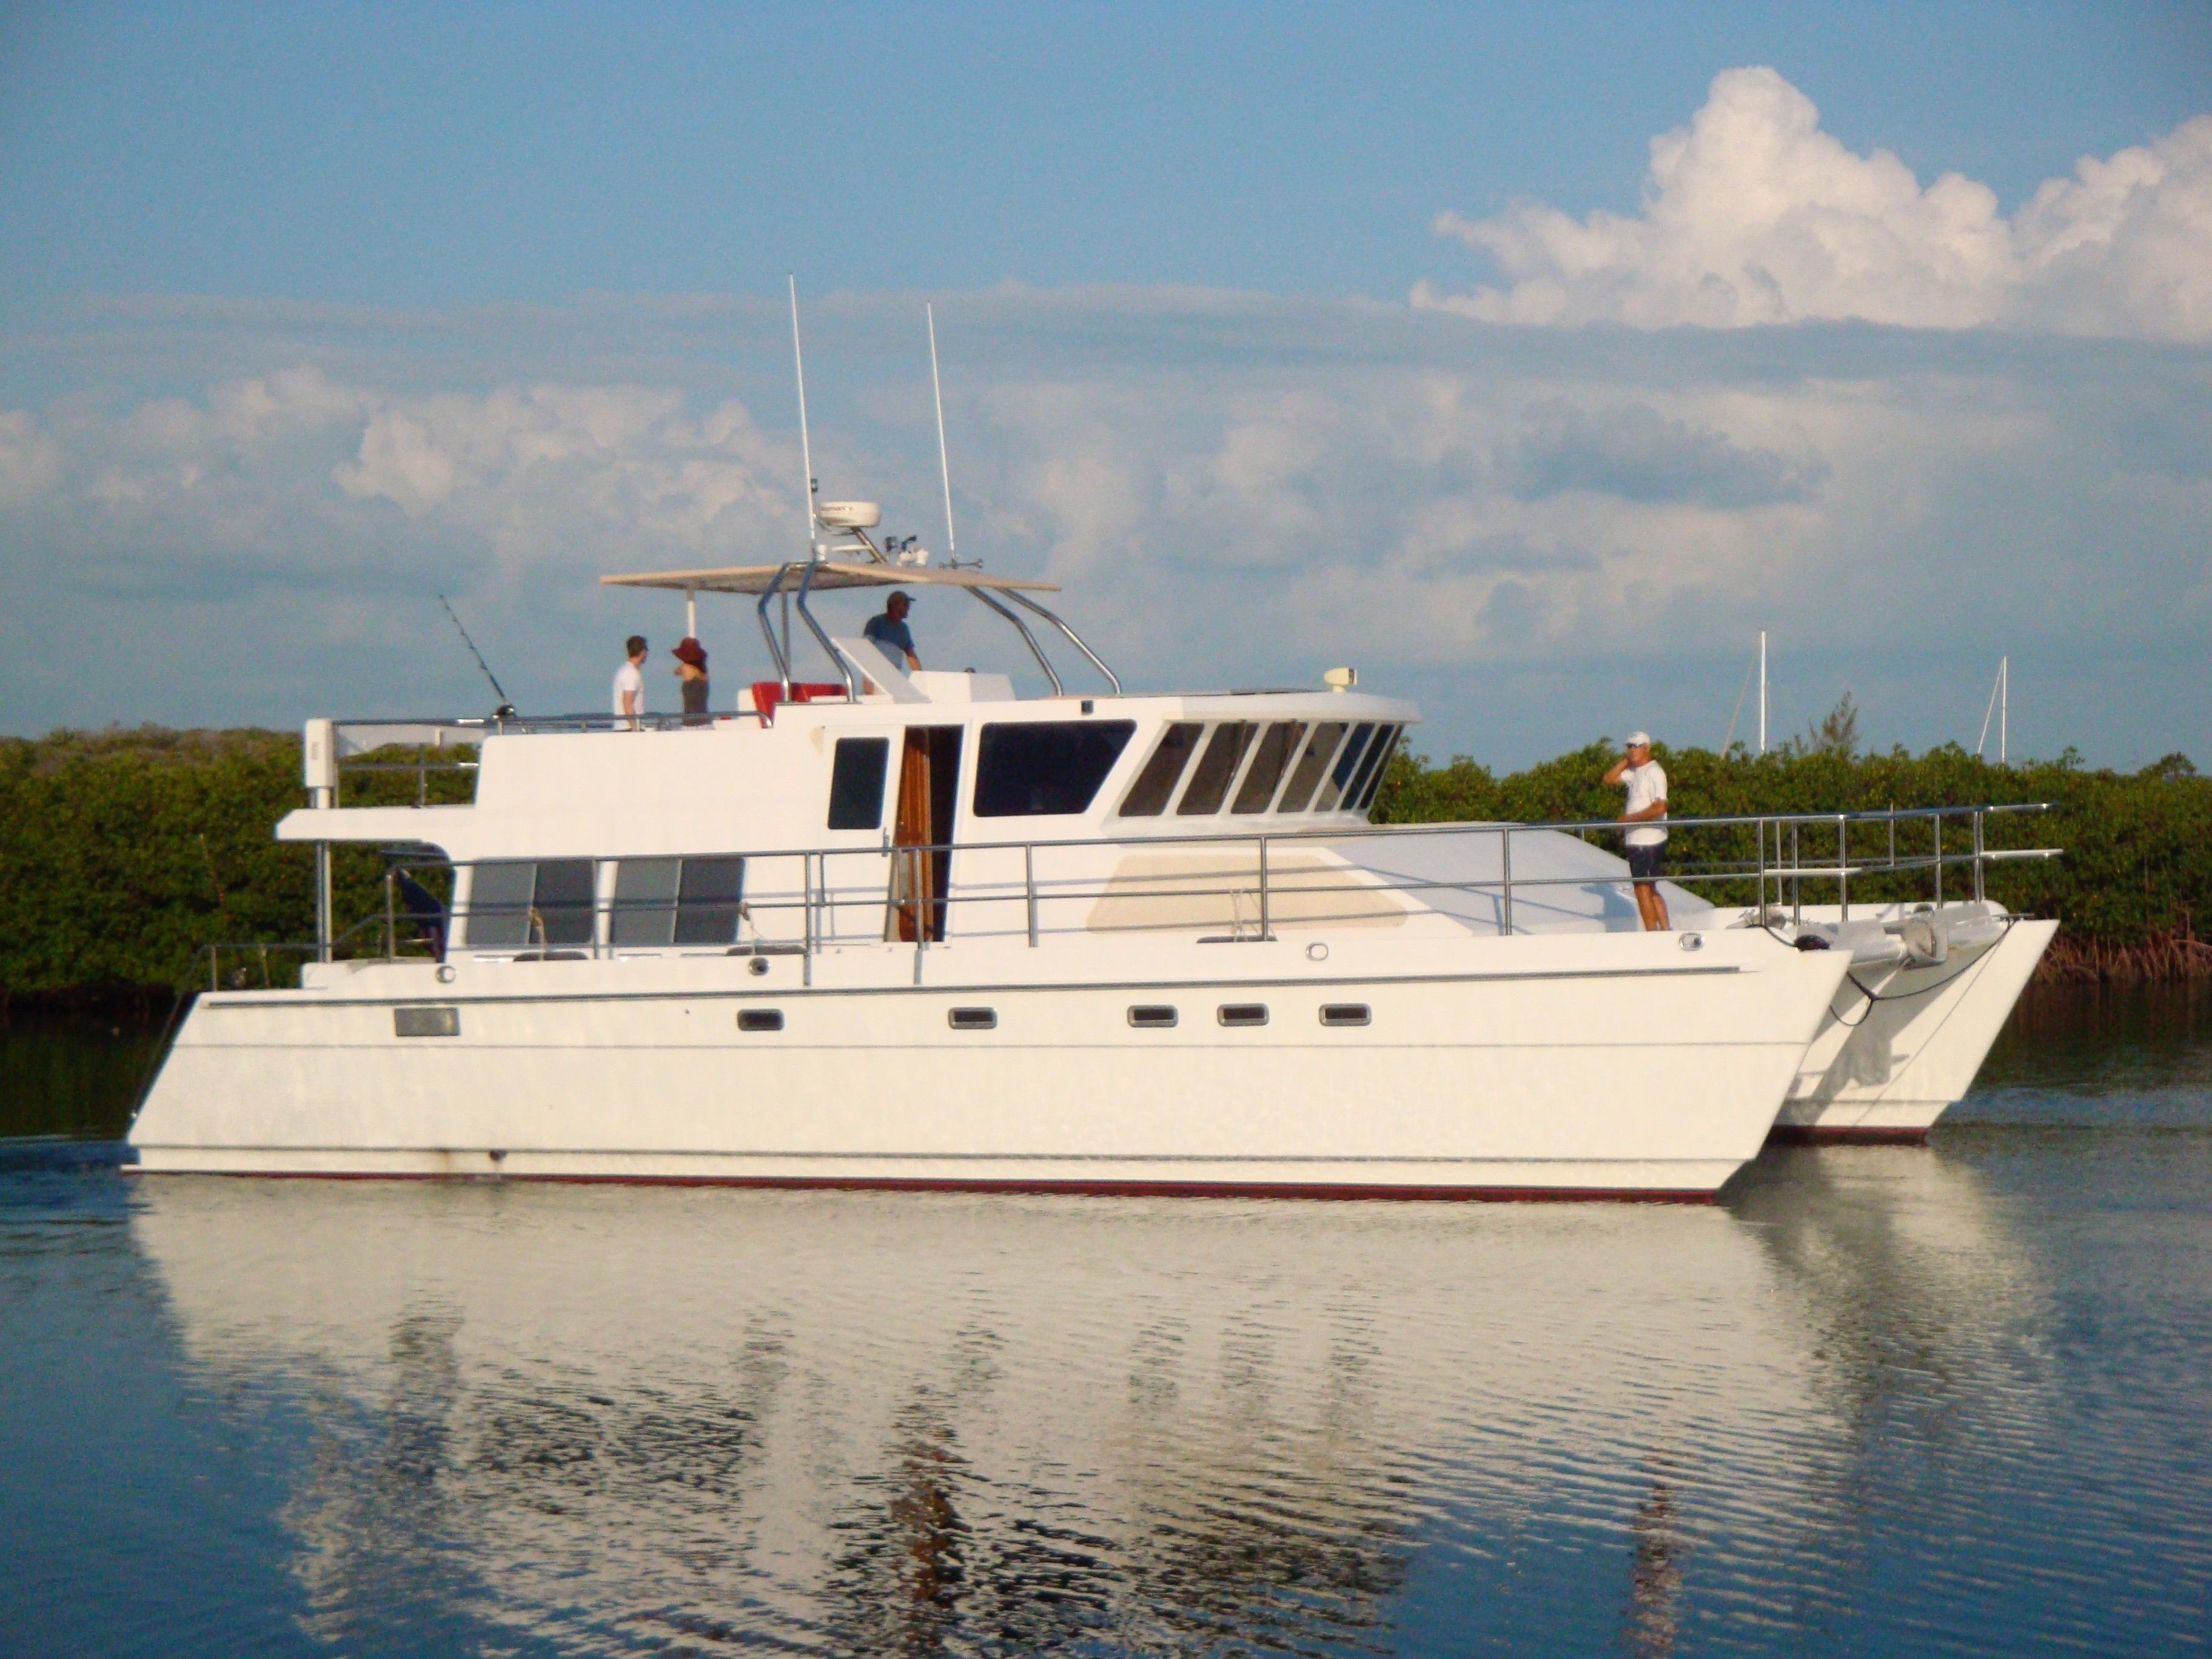 2006 Malcolm Tennant Power Catamaran Power Boat For Sale ...  2006 Malcolm Te...